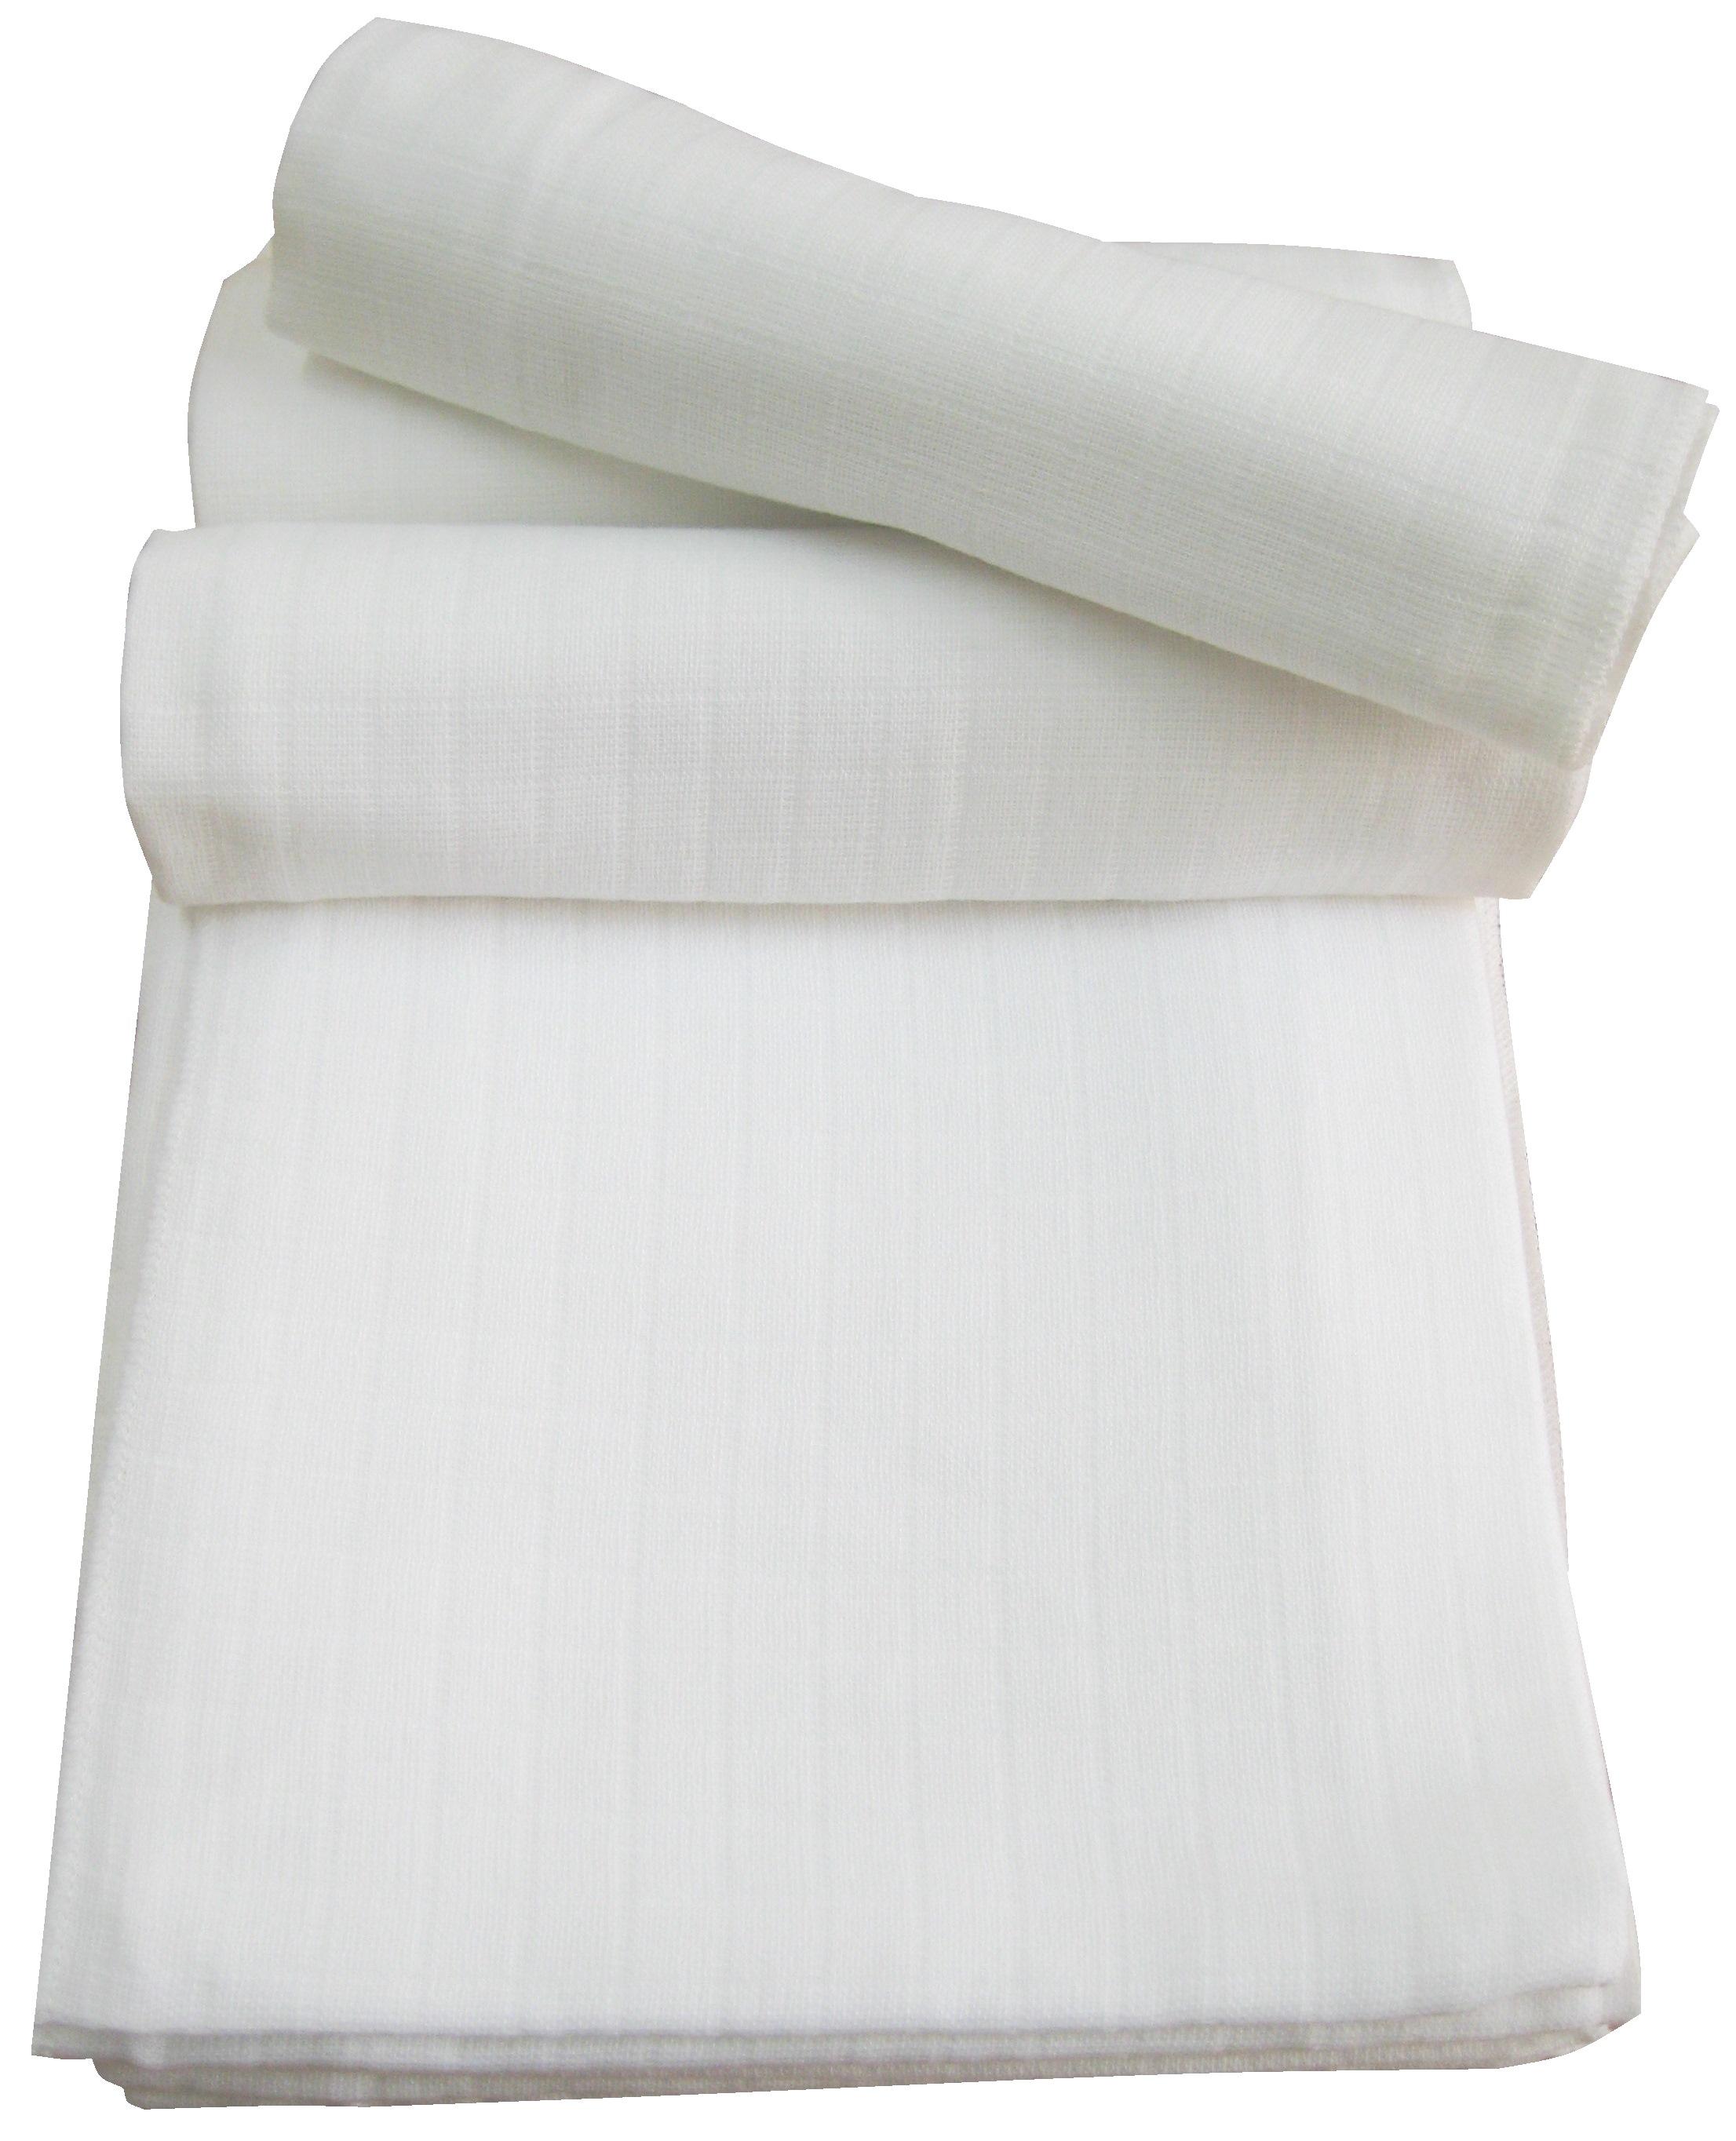 Tetra 70x70 Cm 100 Superabsorber Baumwolle